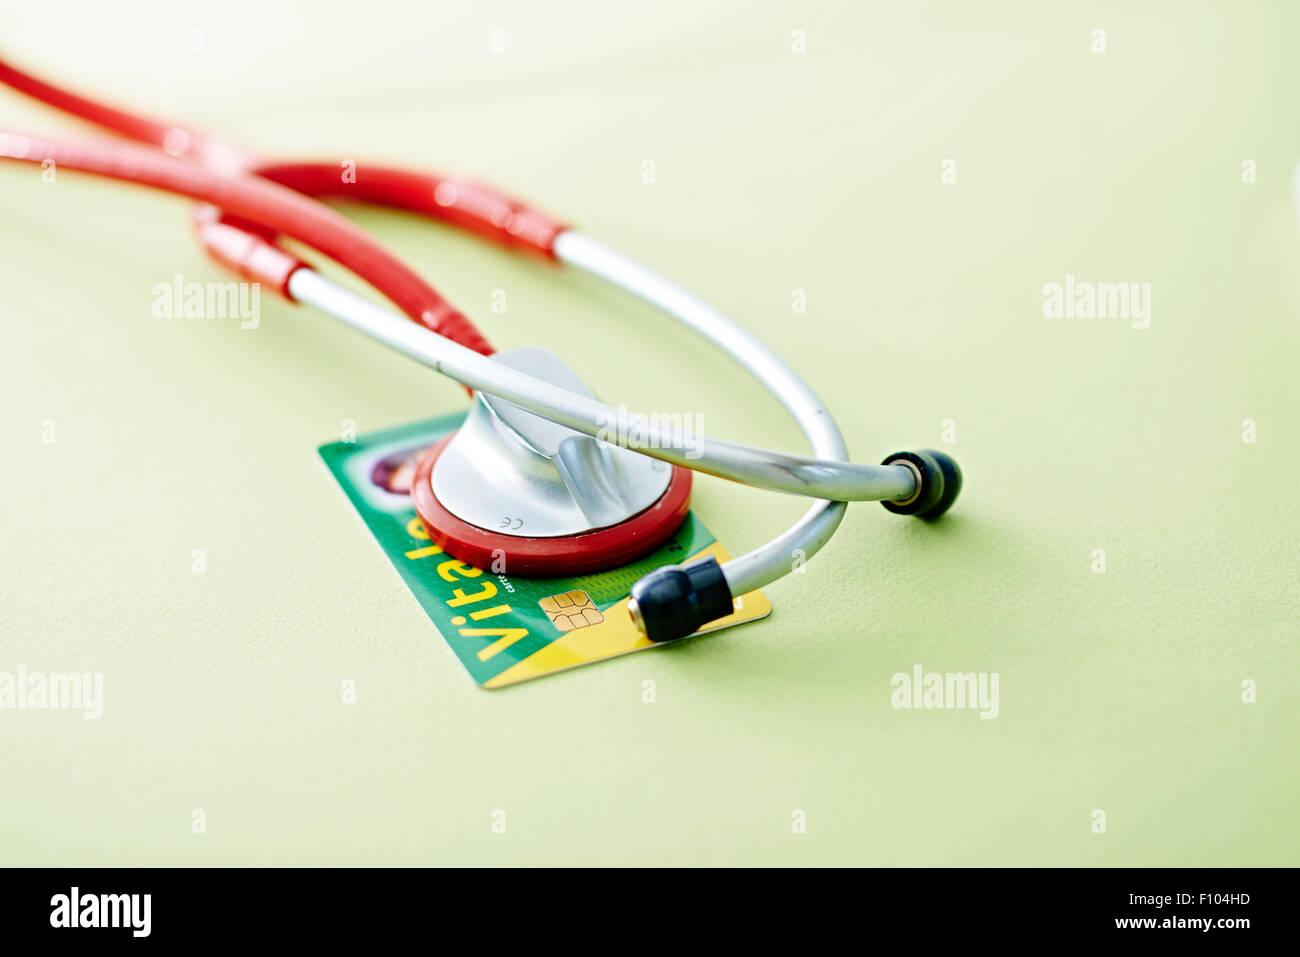 NATIONAL HEALTH SERVICE CARD Stock Photo